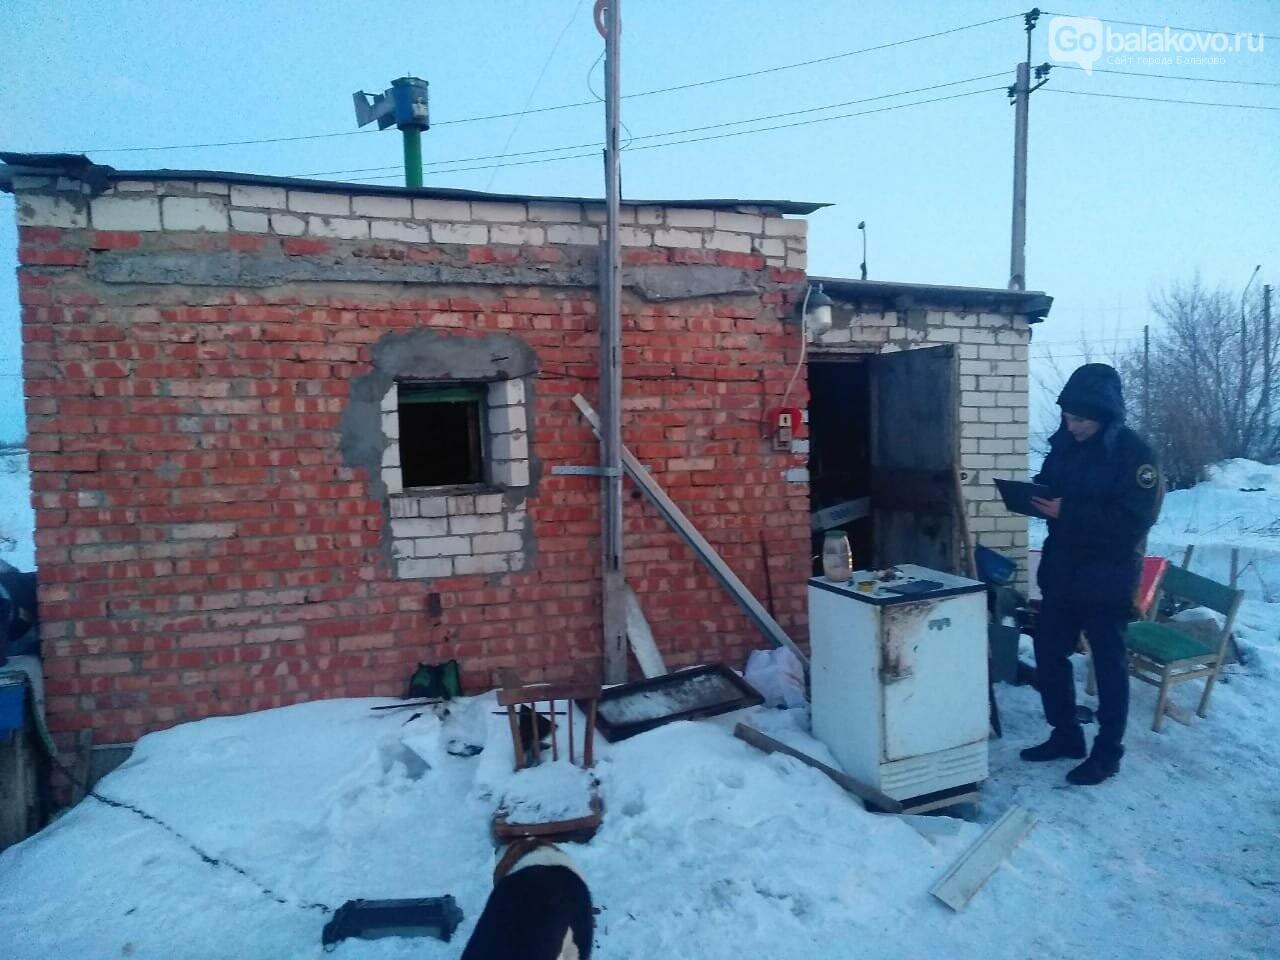 В сторожке на окраине Балаково найден труп мужчины, фото-3